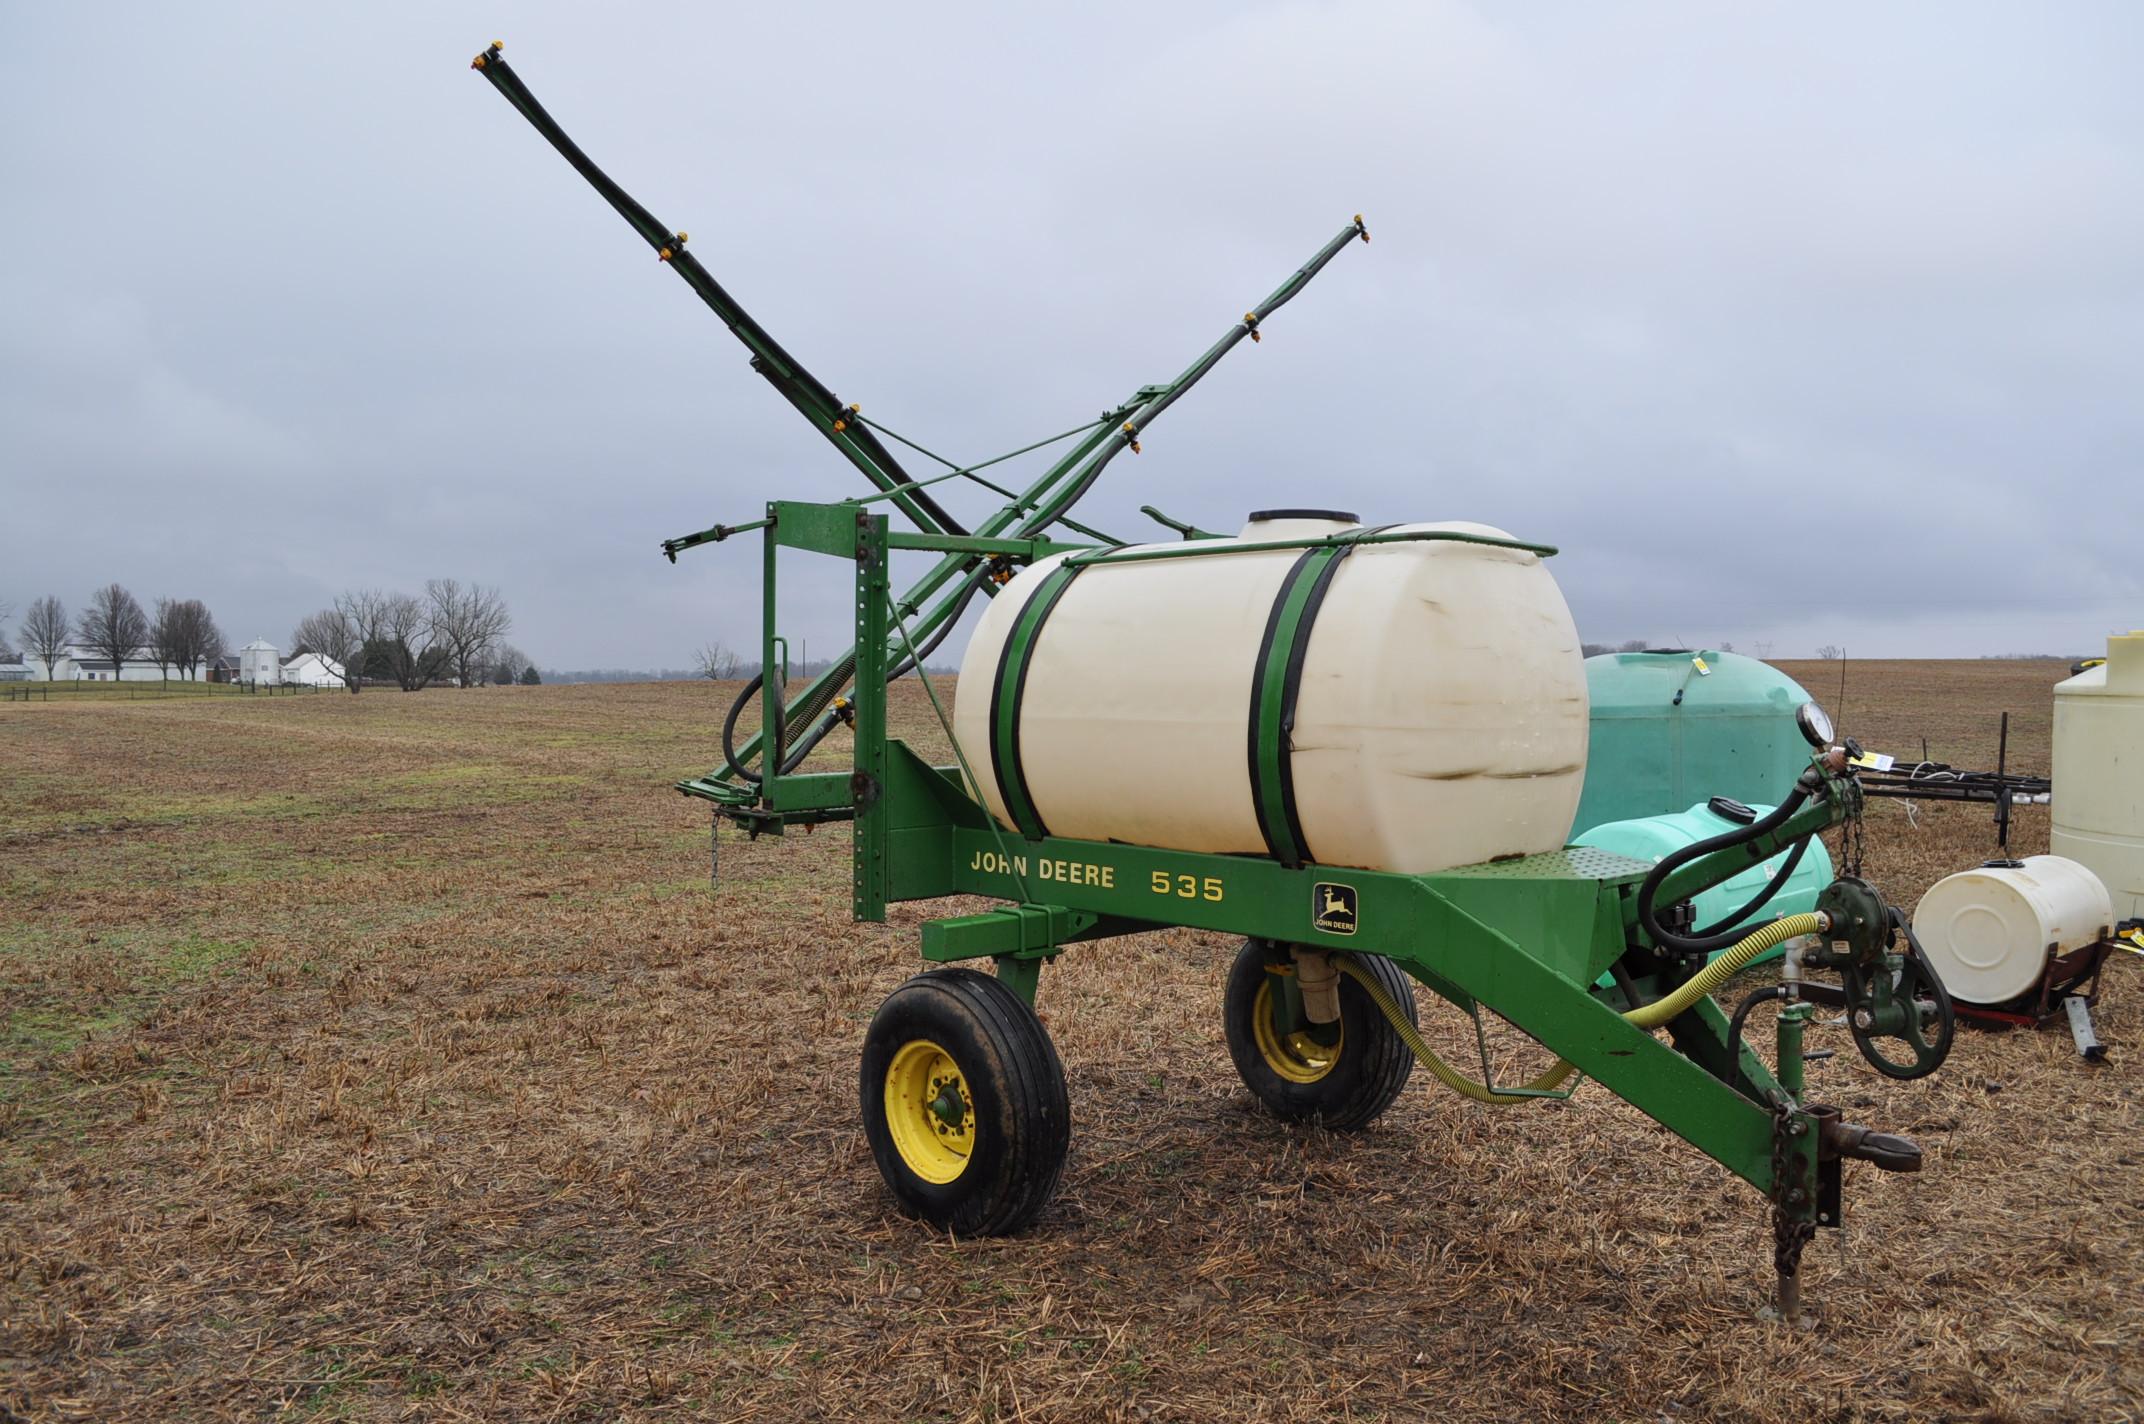 John Deere 535 pull-type sprayer, 350 gallon tank, 30' boom - Image 2 of 11